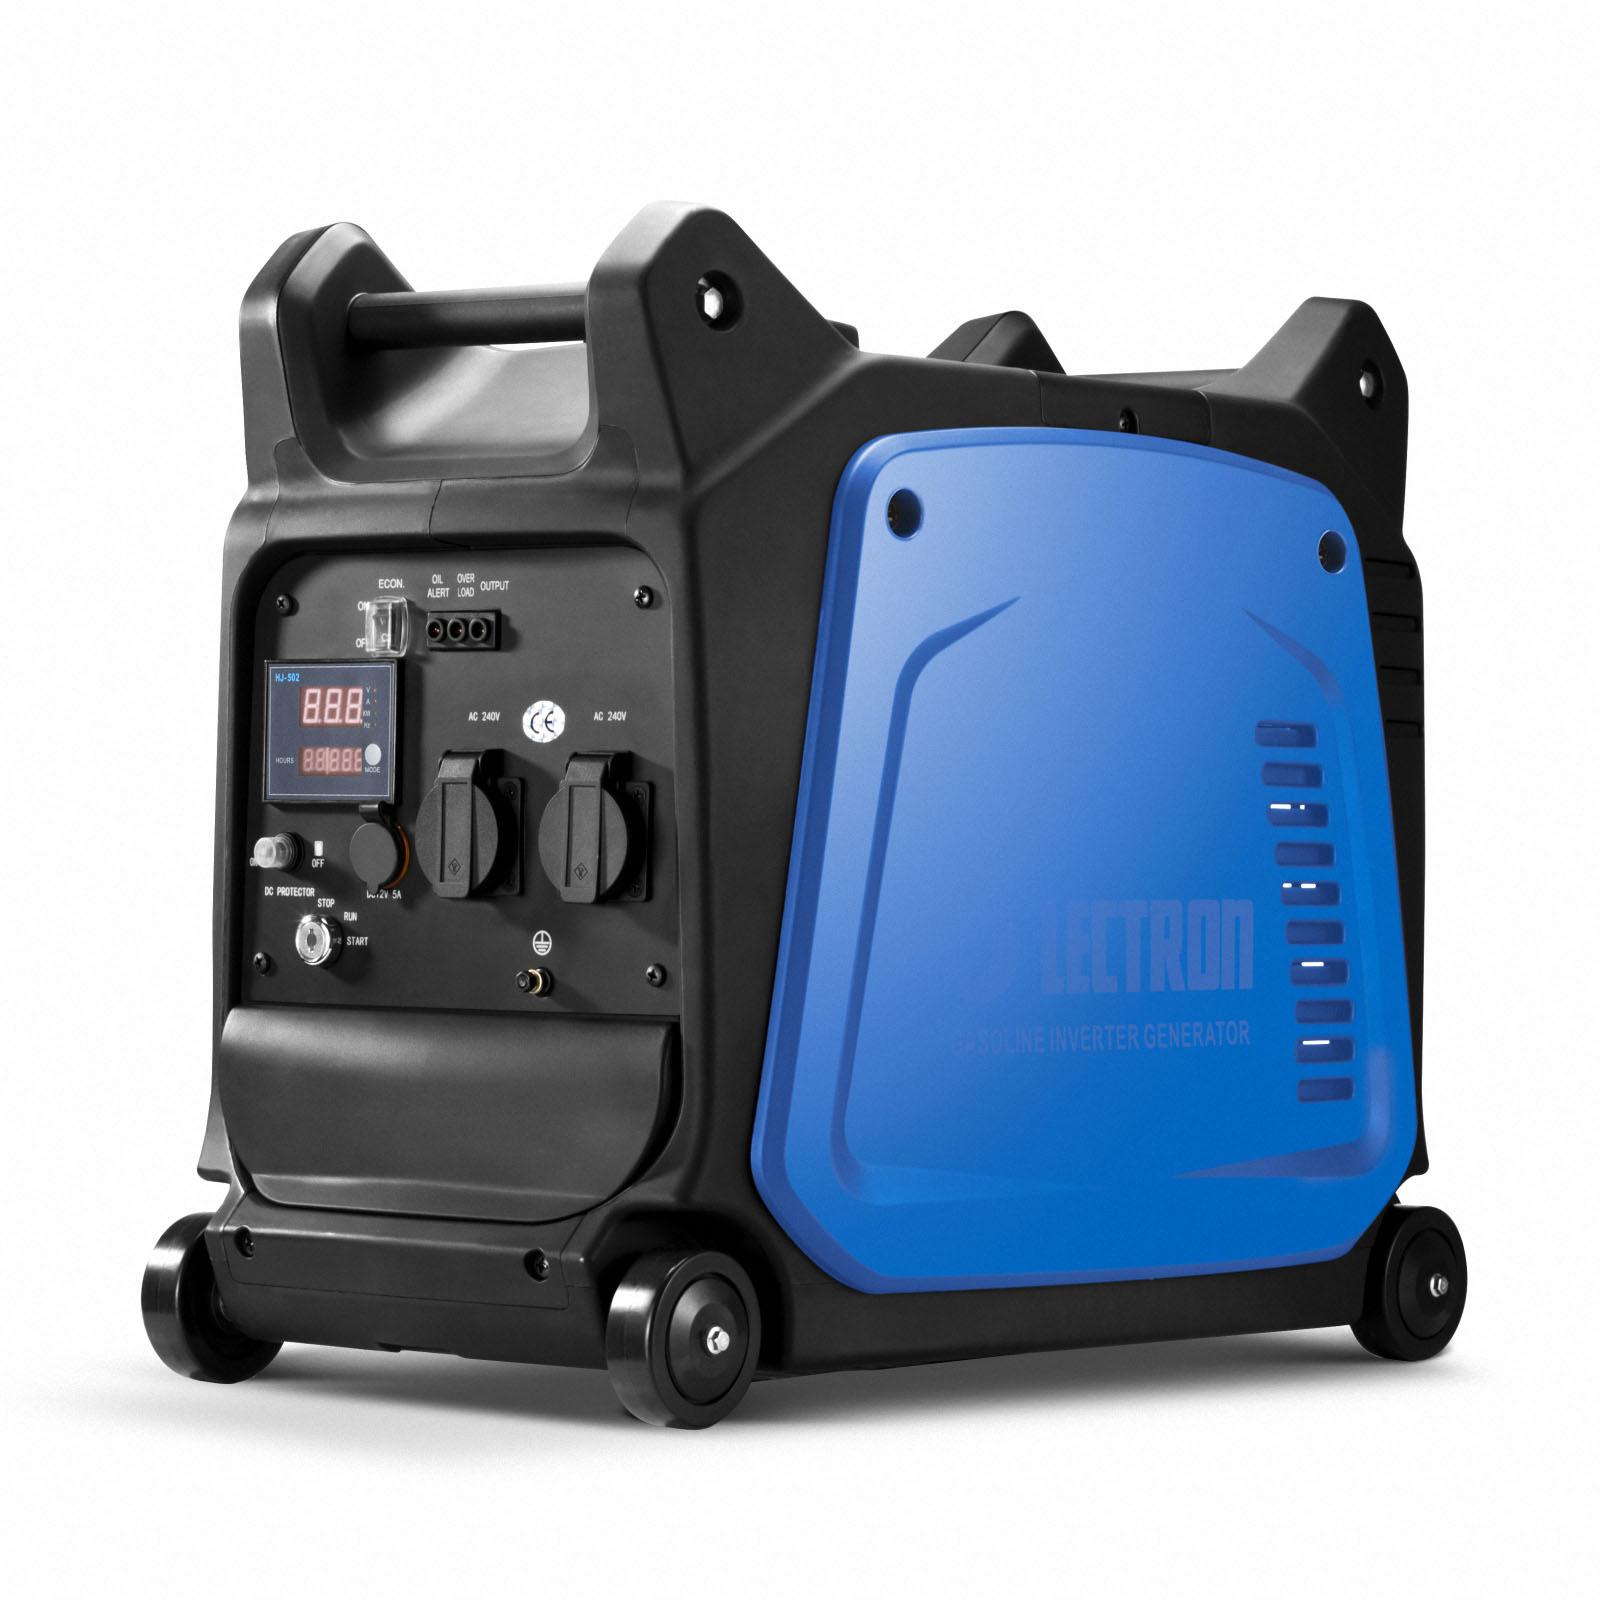 GenTrax Inverter Generator 3.5KW Max 12v Remote Start Portable Petrol Camping 3